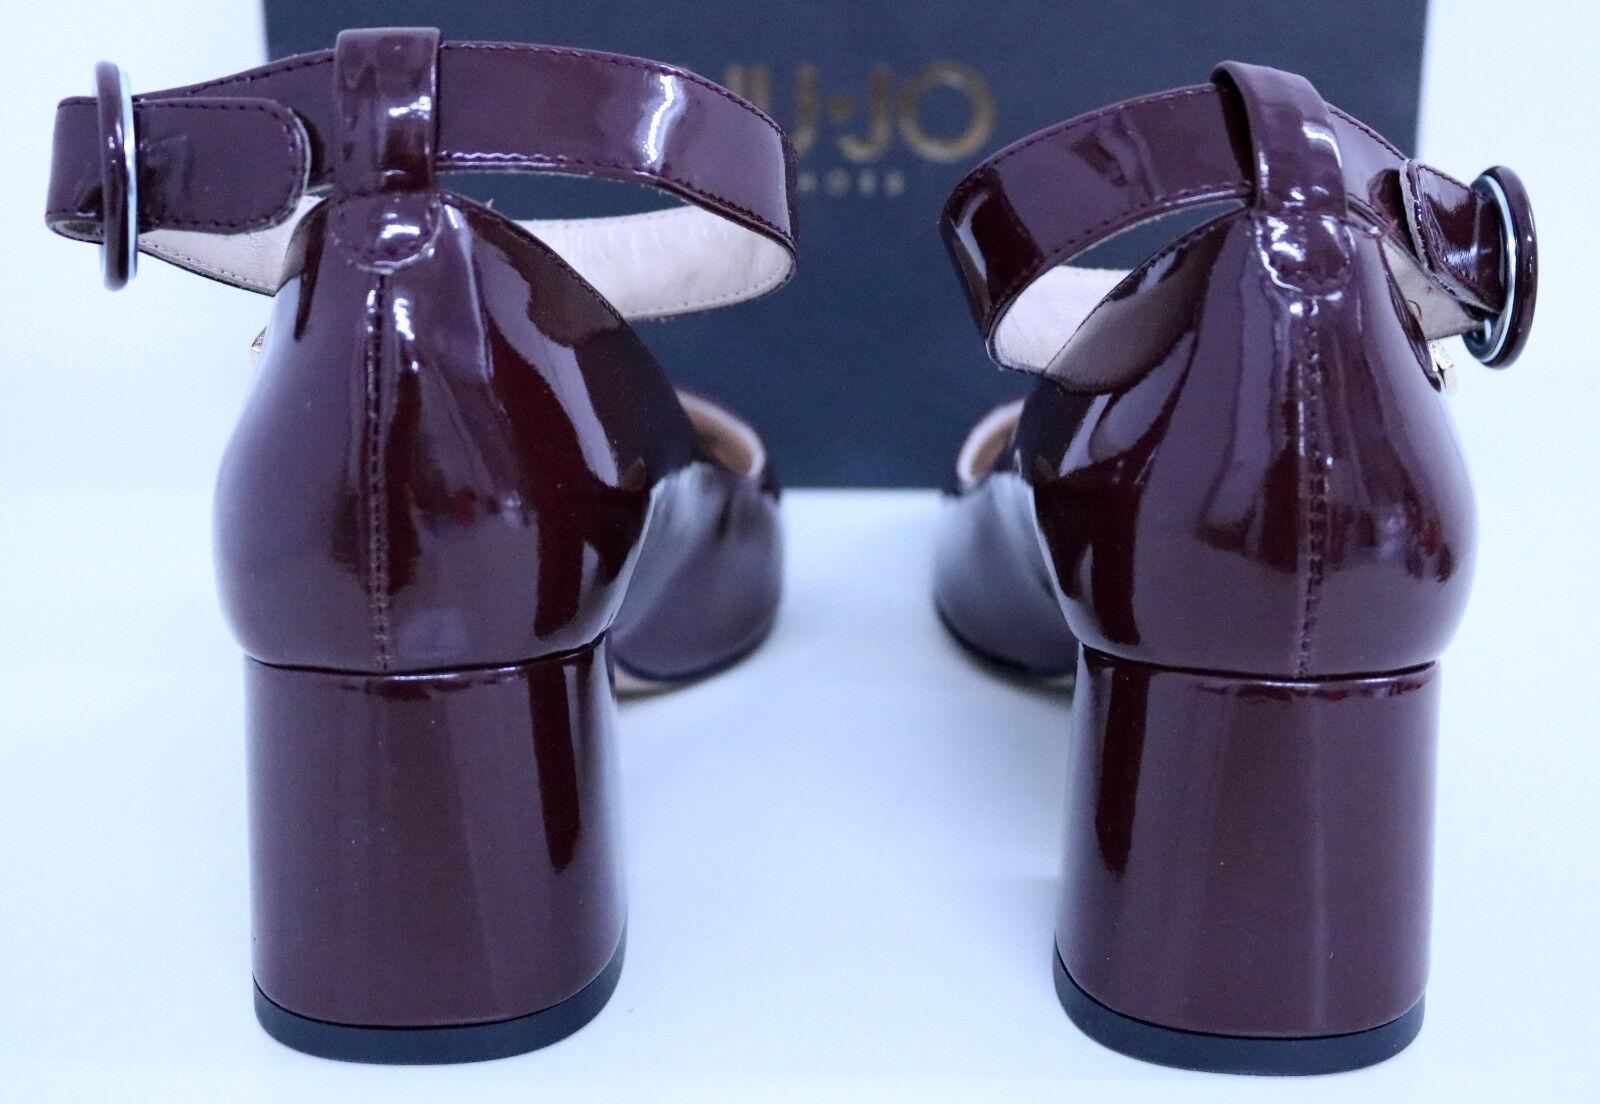 LIU°JO Pumps Lackschuhe Bordeaux Gr.38 Lackleder Bordeaux Lackschuhe NEU+OVP Ladenpreis 626713